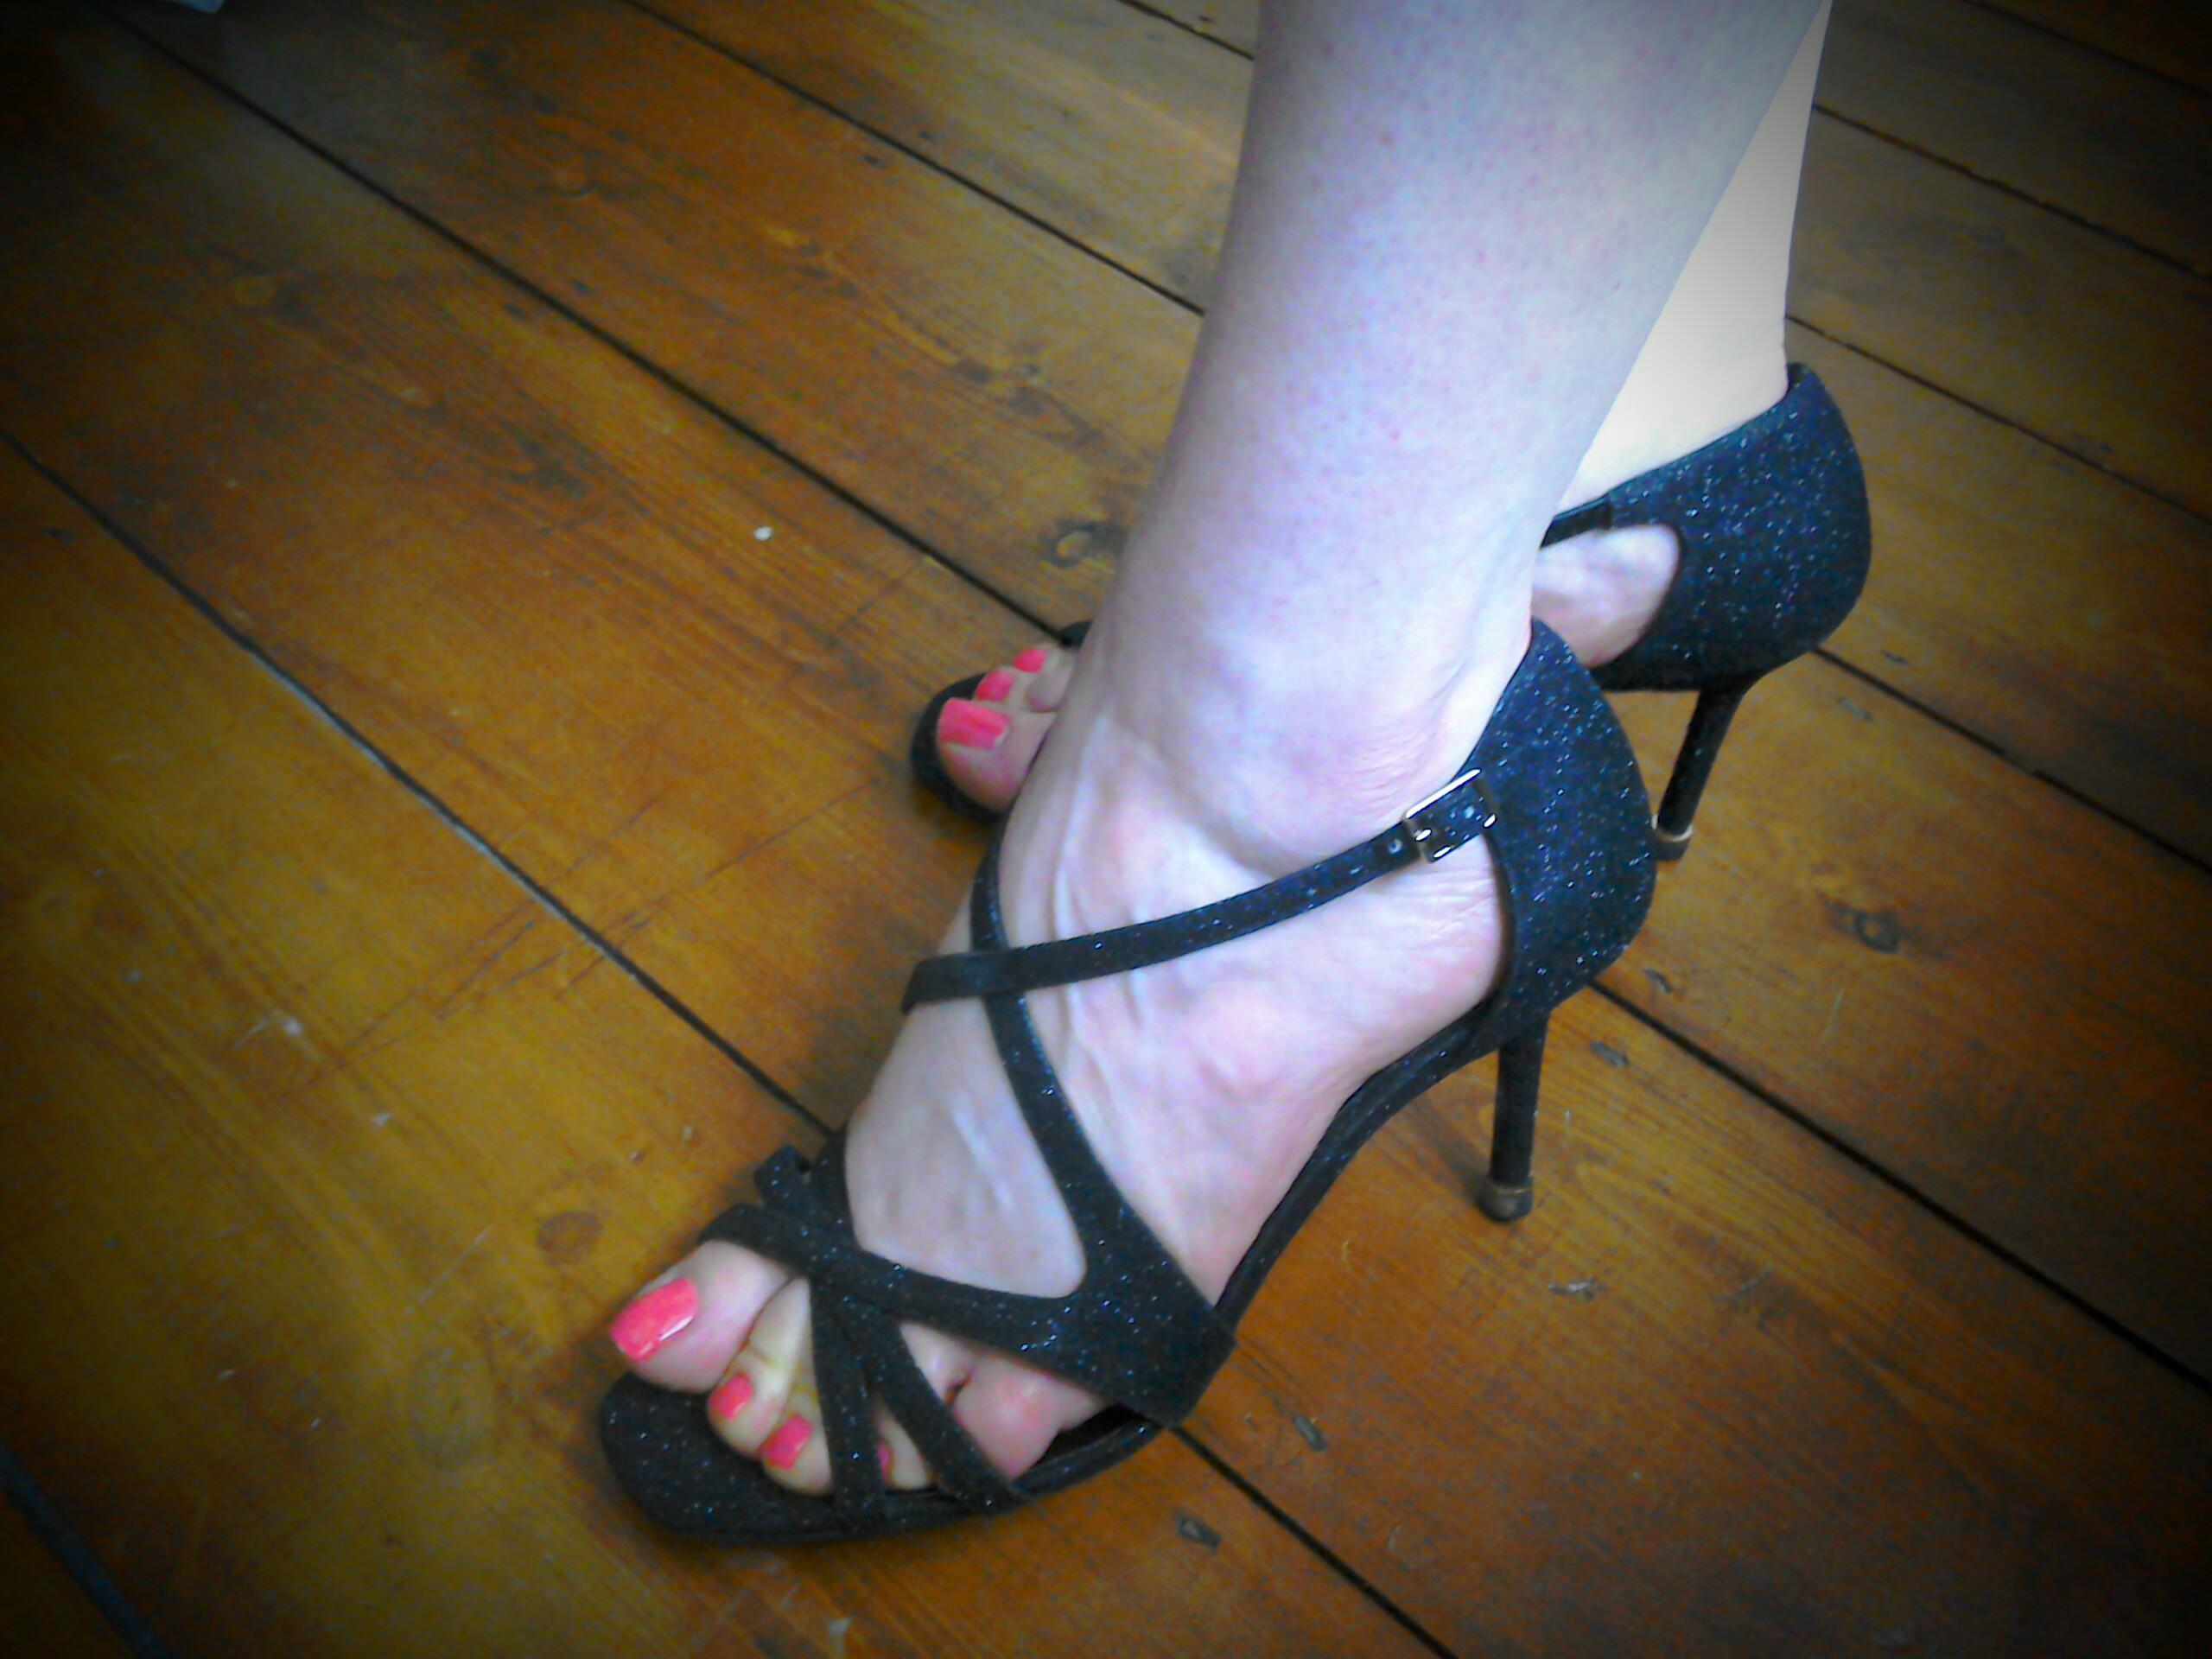 Marilyn style sandals – The Girl loves